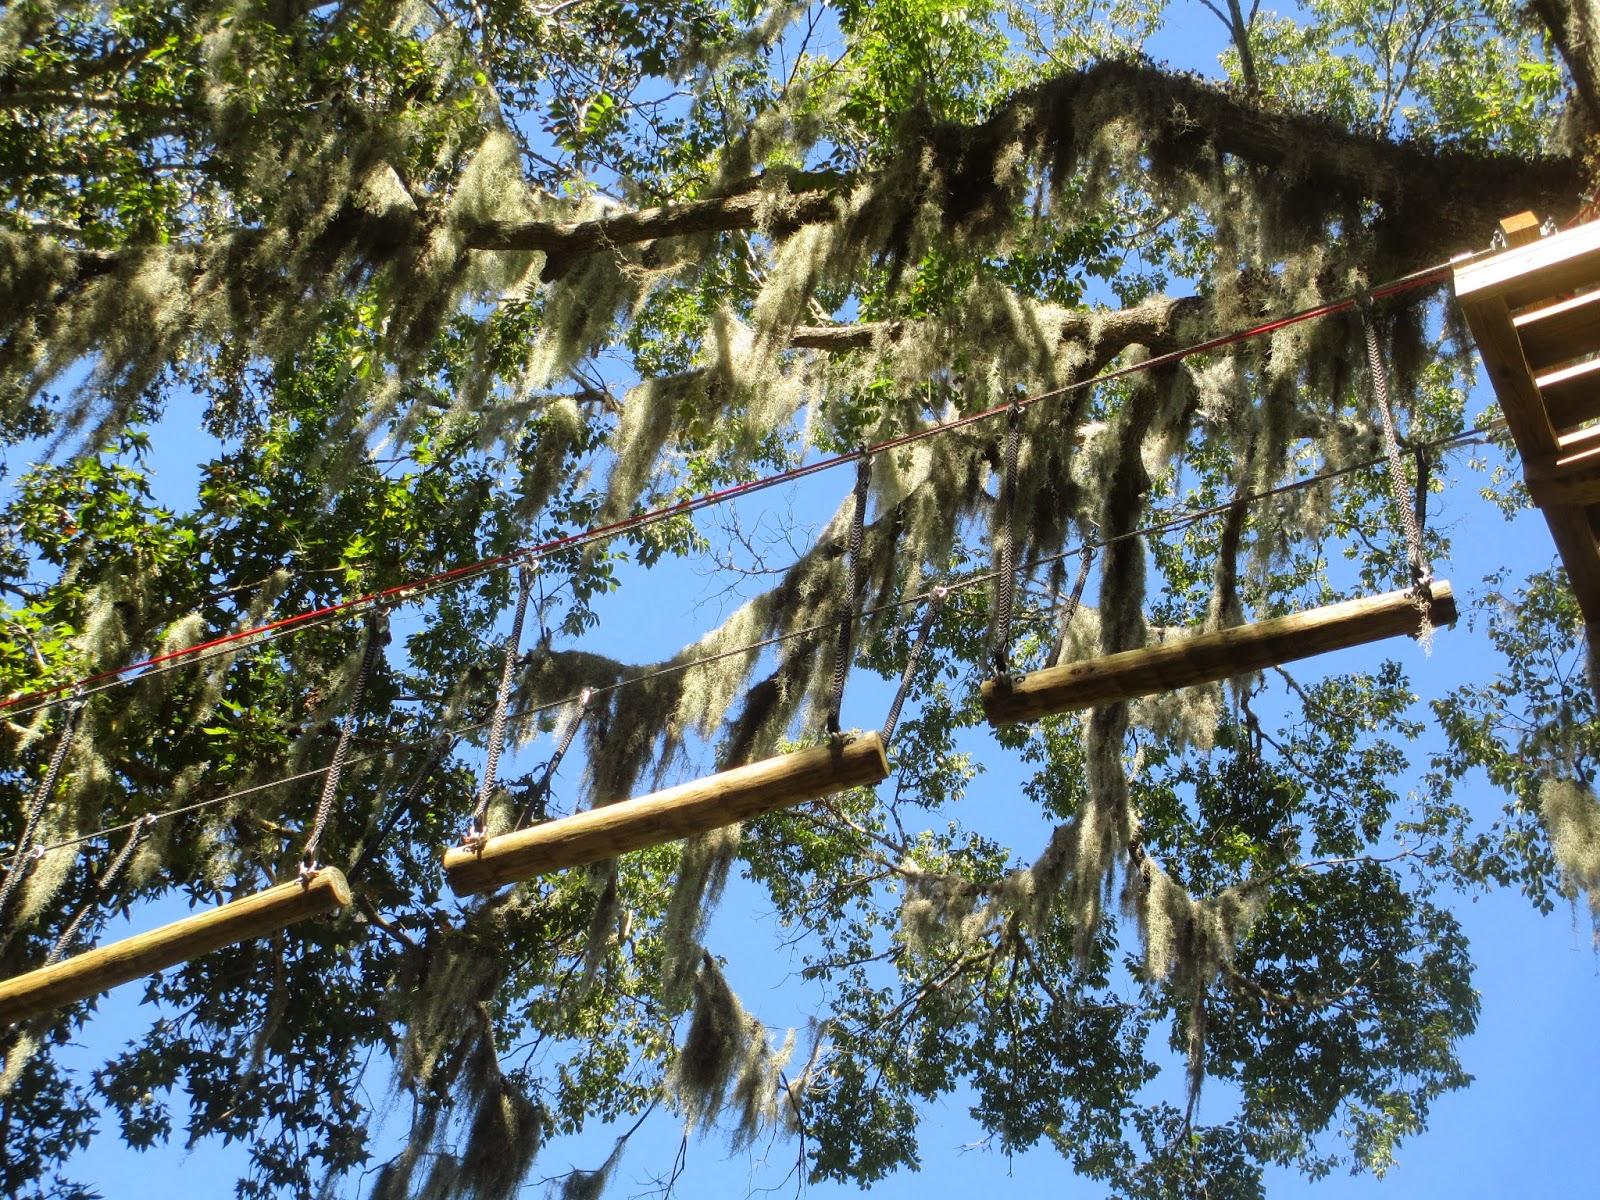 Ziplining Across The Usa Sunday October 27 Zoom Air Daytona